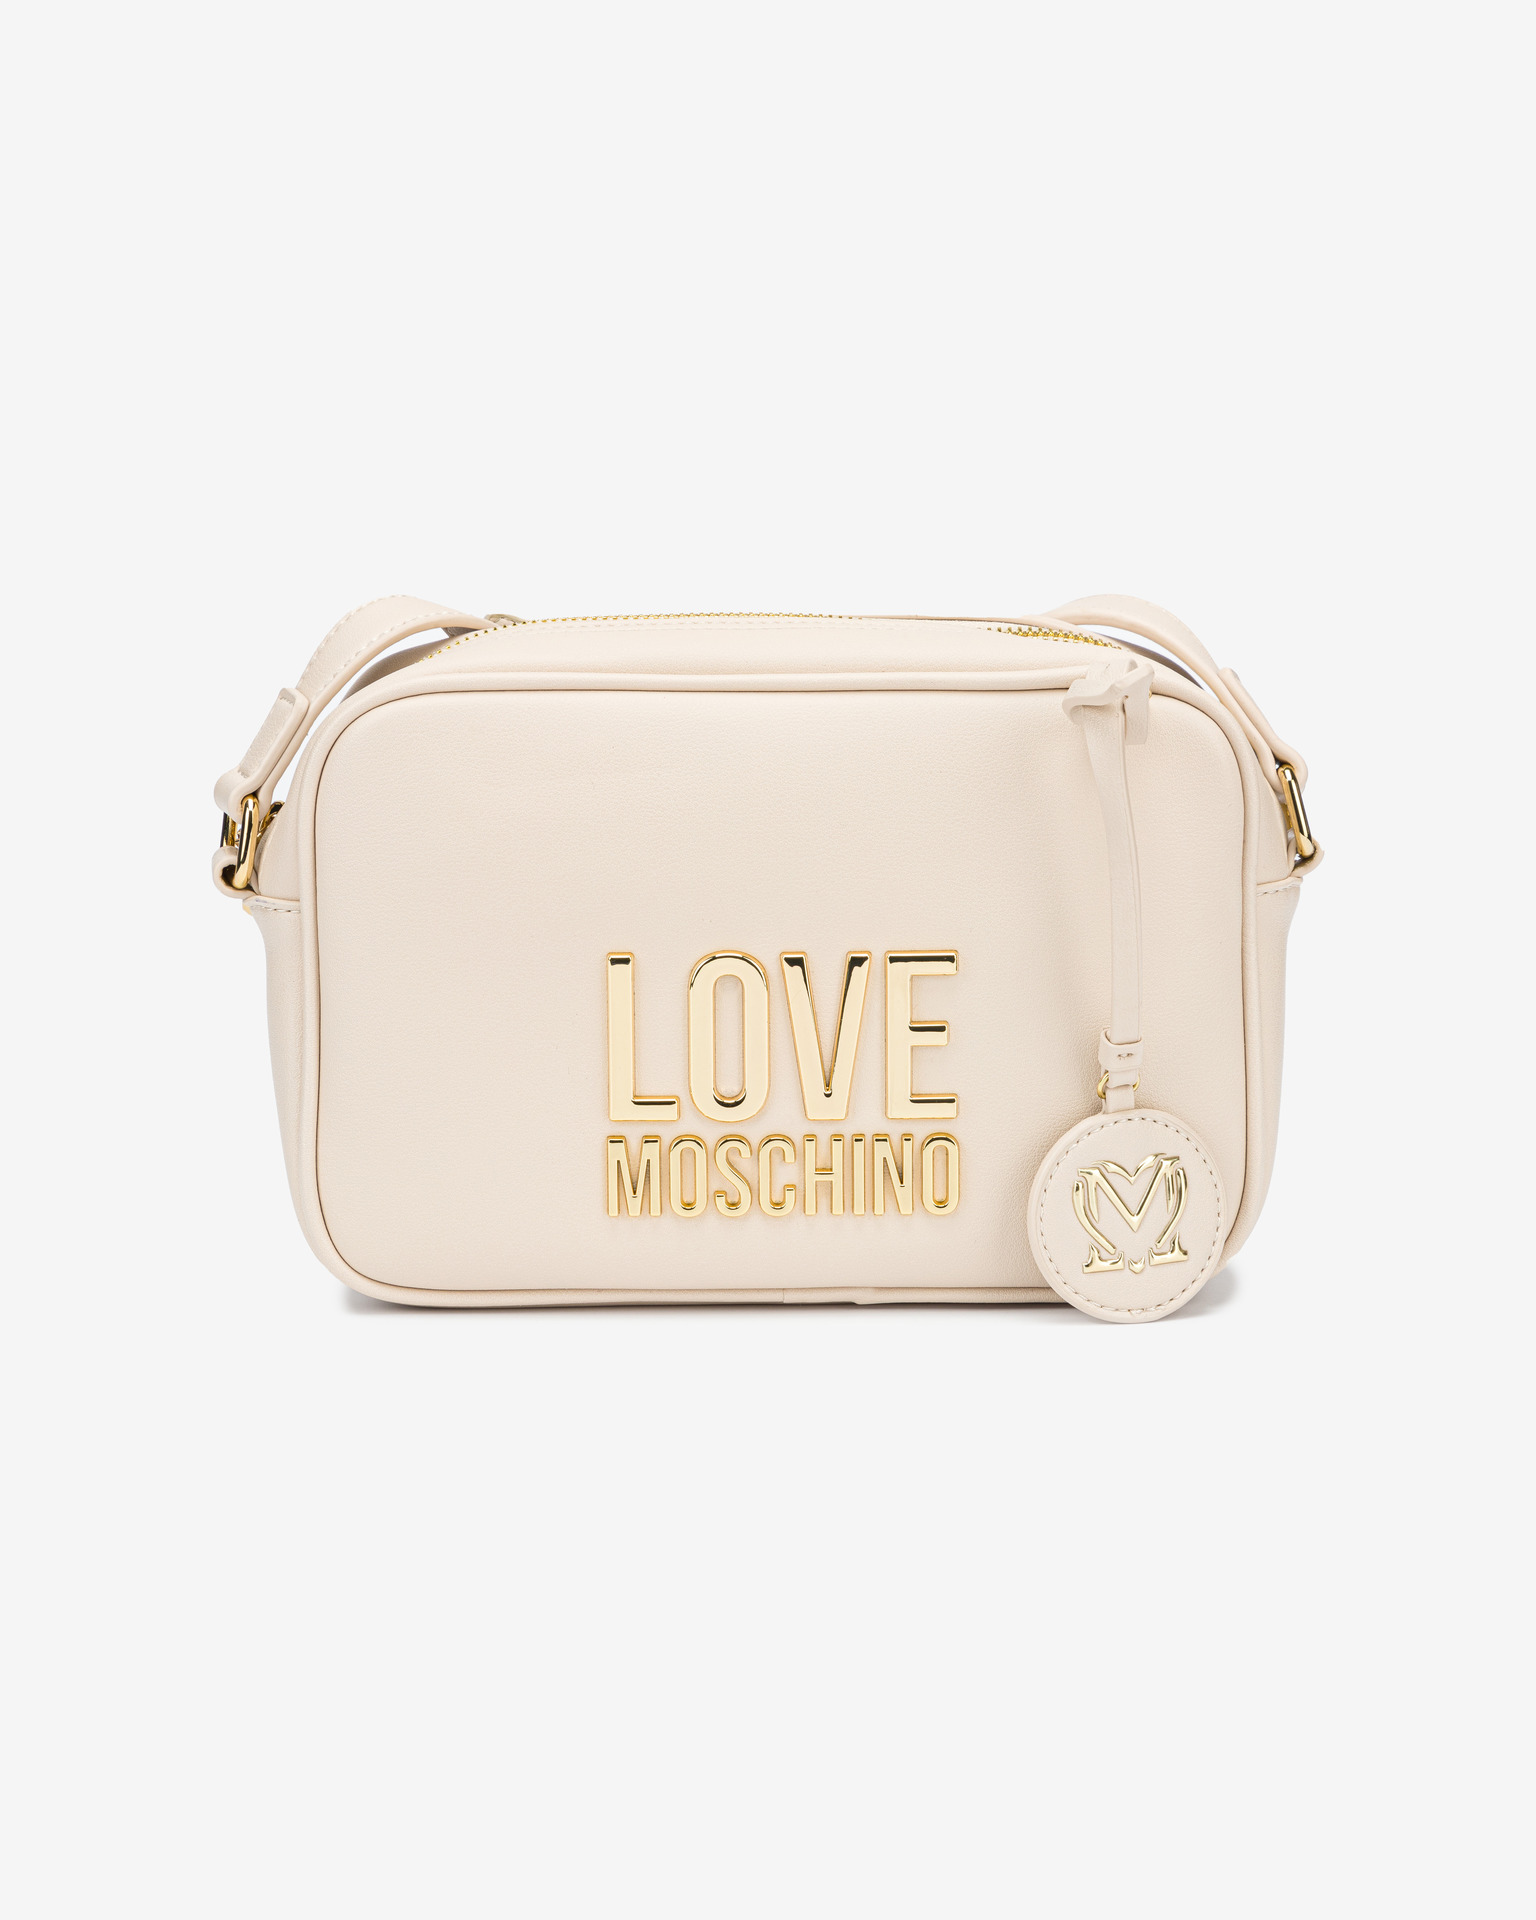 Love Moschino fehér crossbody kézitáska